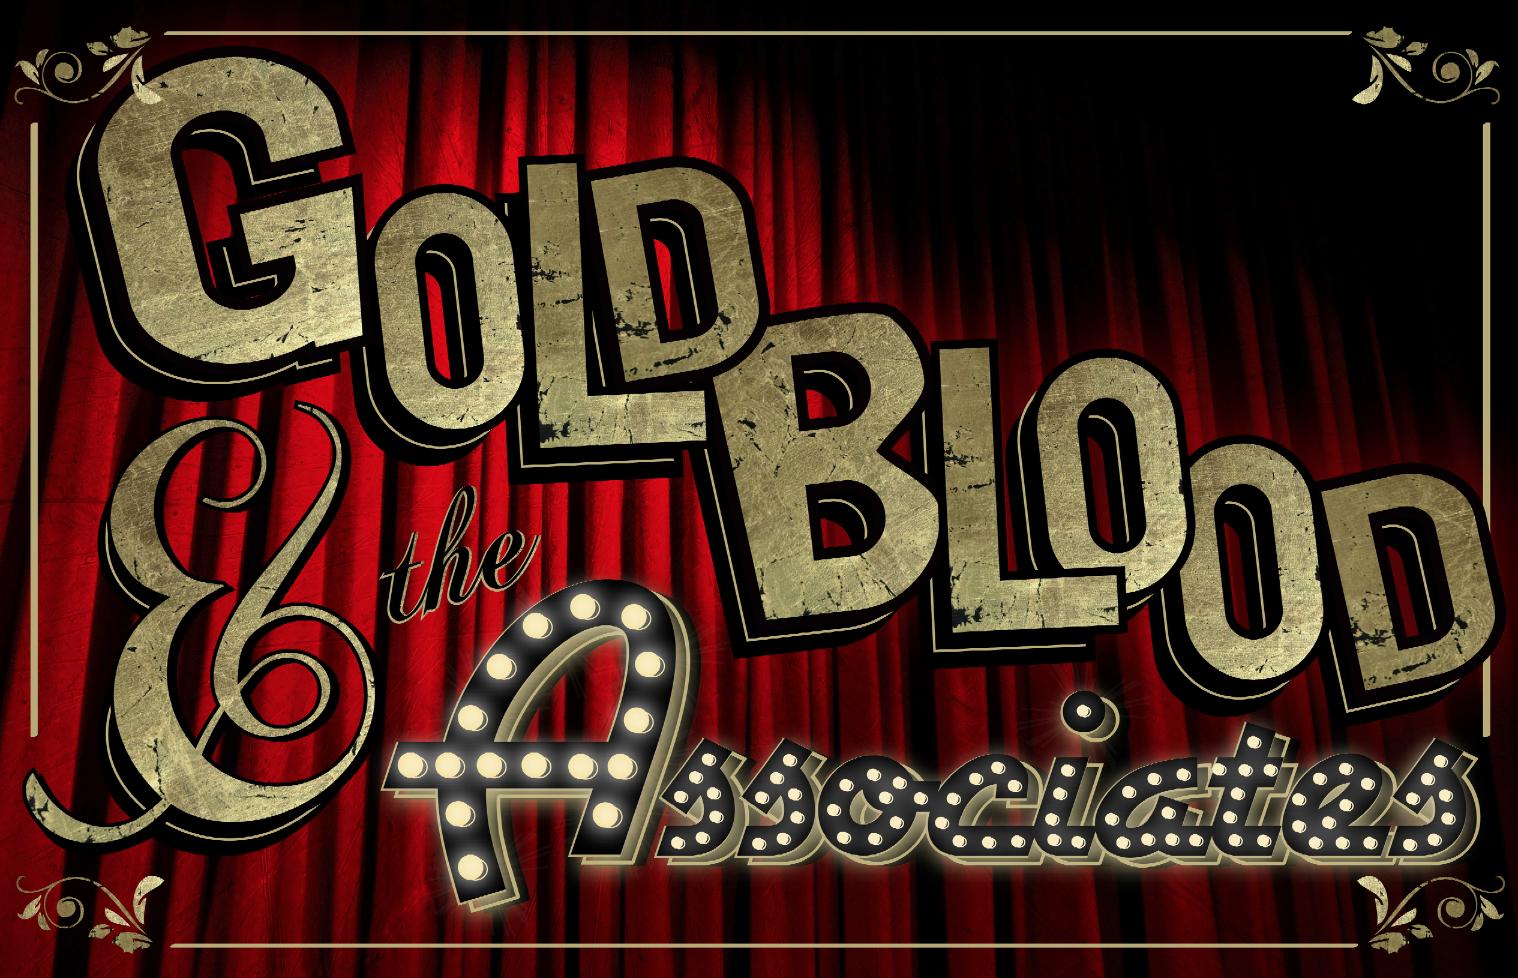 GoldBlood and Associates